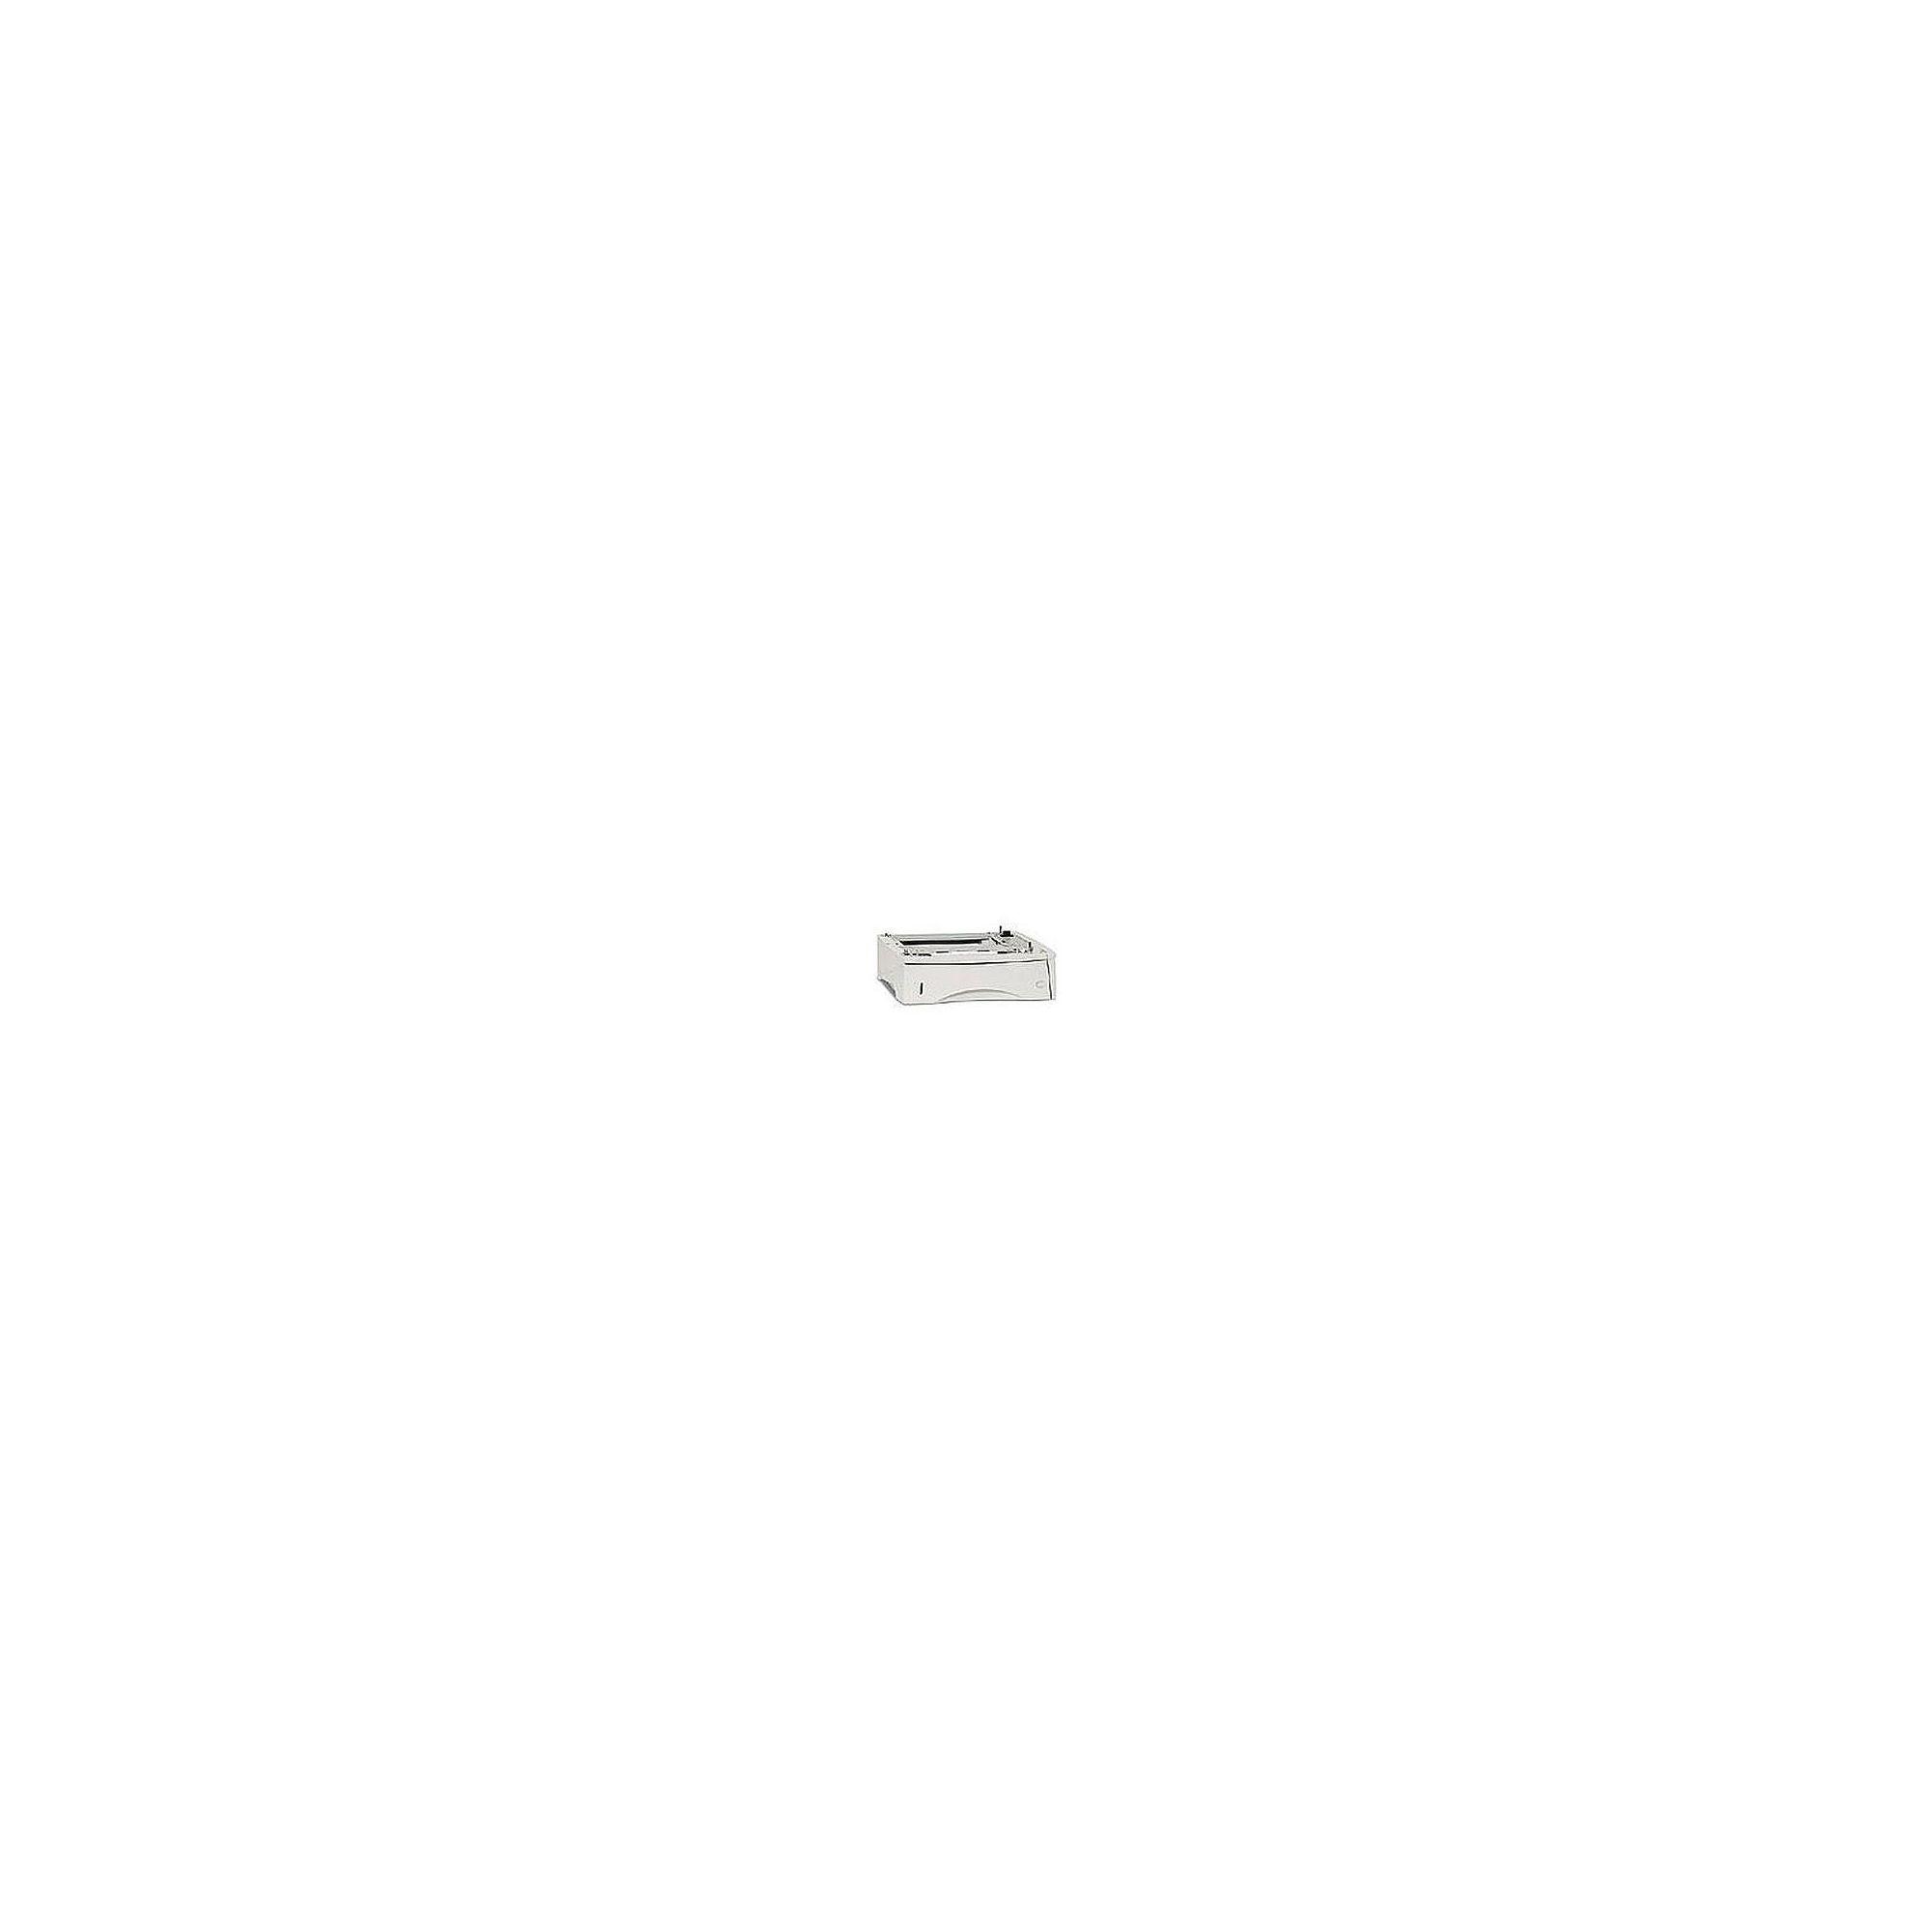 HP Q7548A LaserJet 500-sheet Input Tray at Tesco Direct